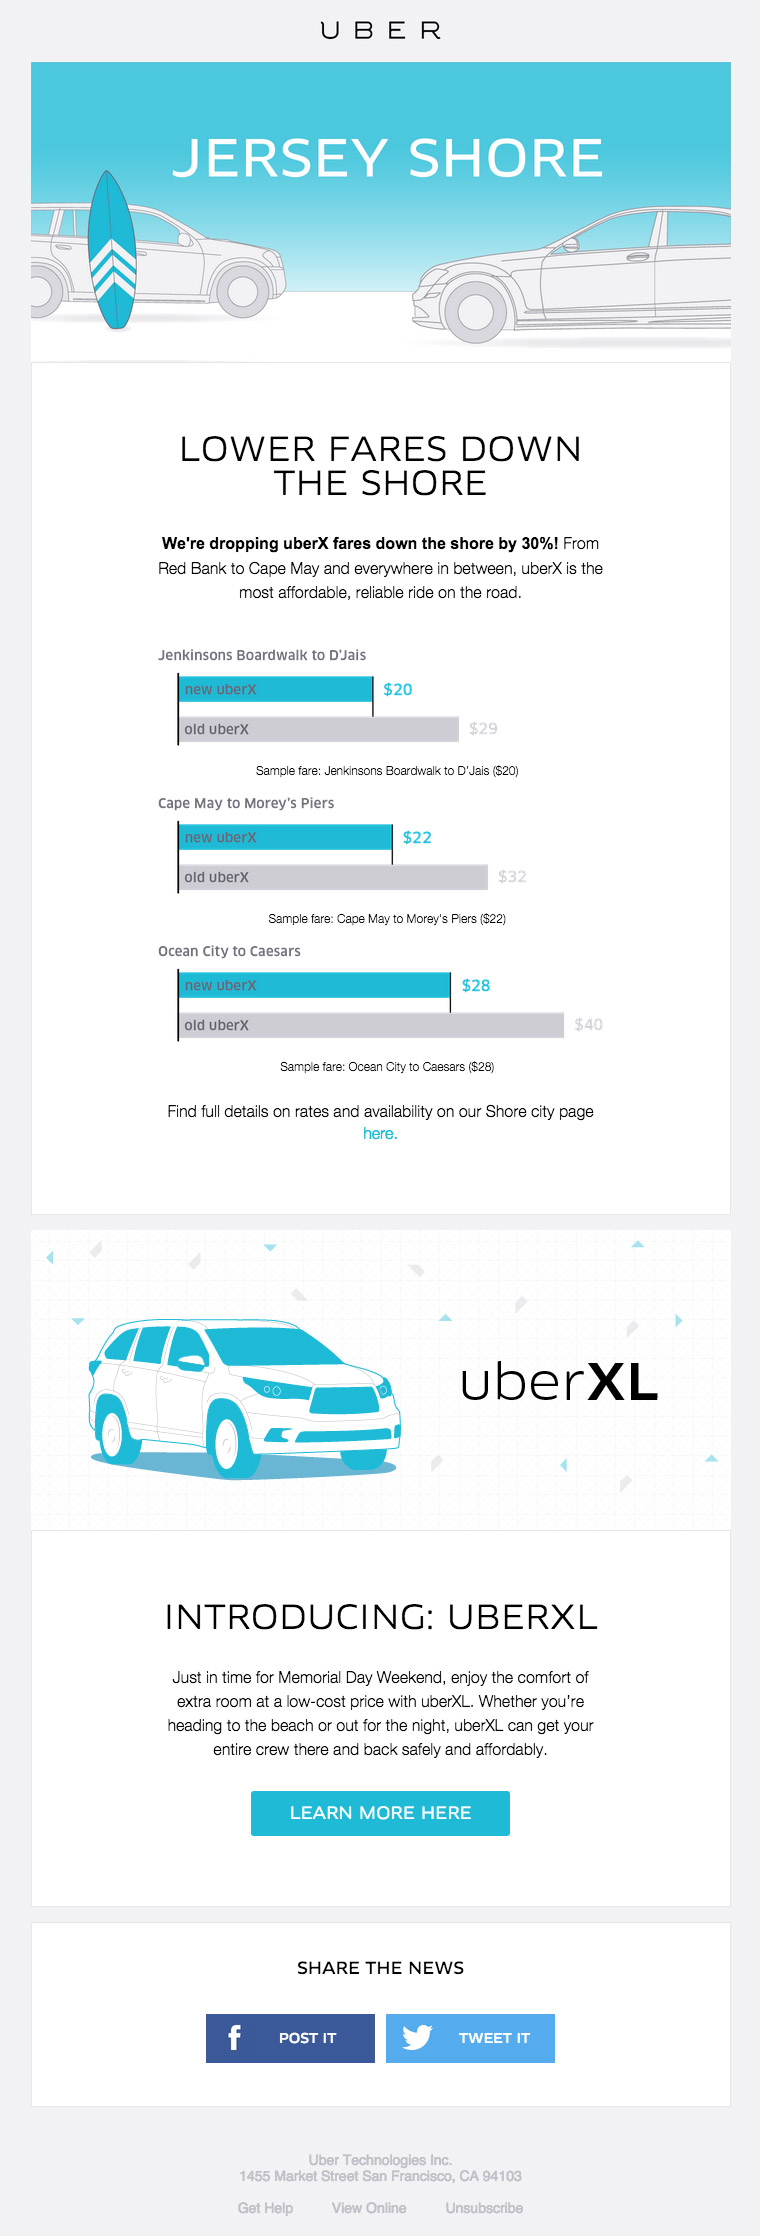 Uber_Lower_Fares_Email.jpg